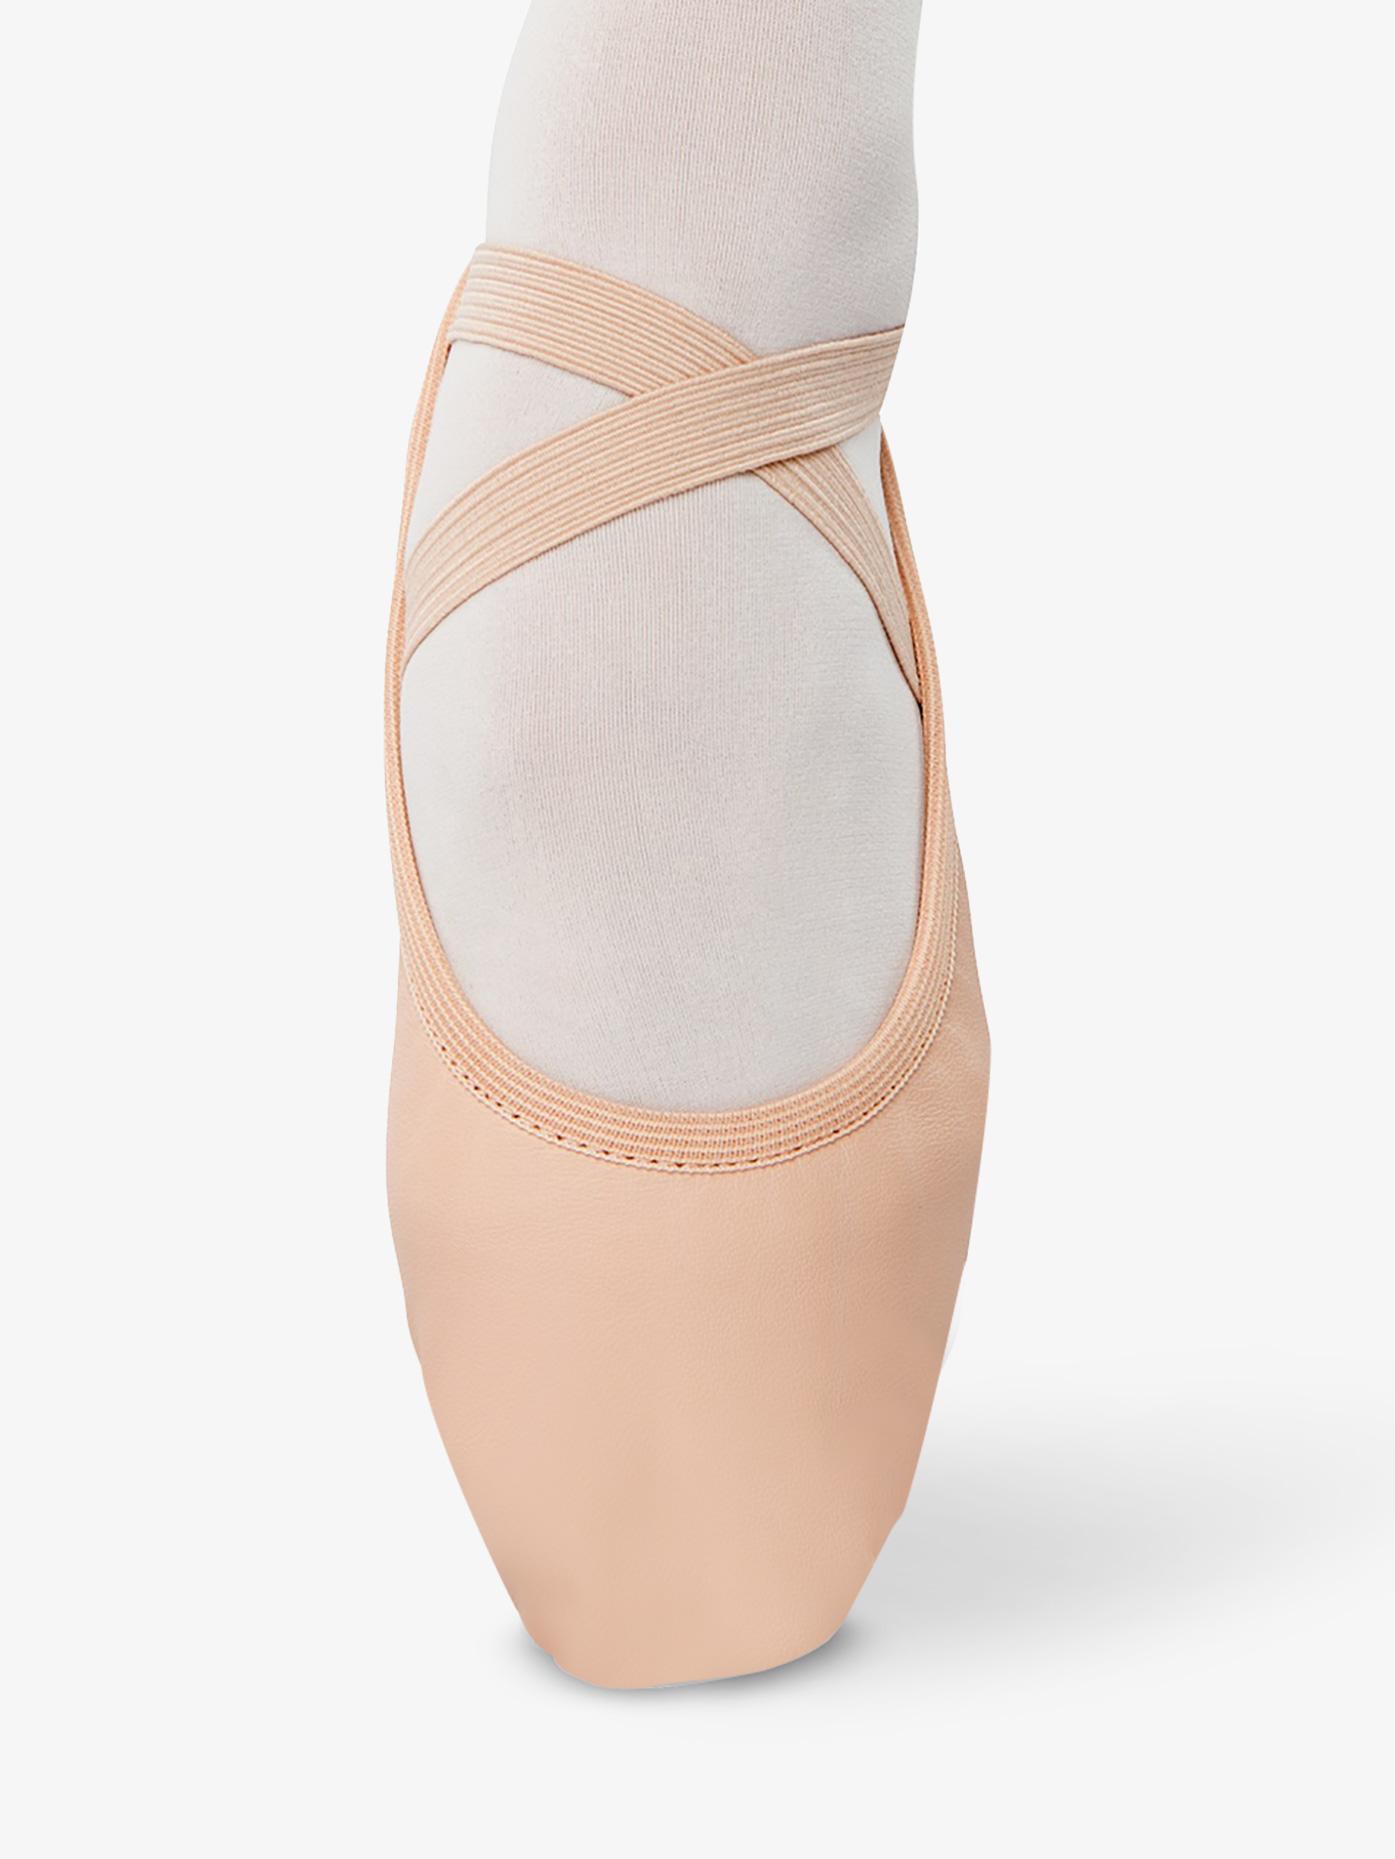 Danshuz Ballet Shoes Sizing